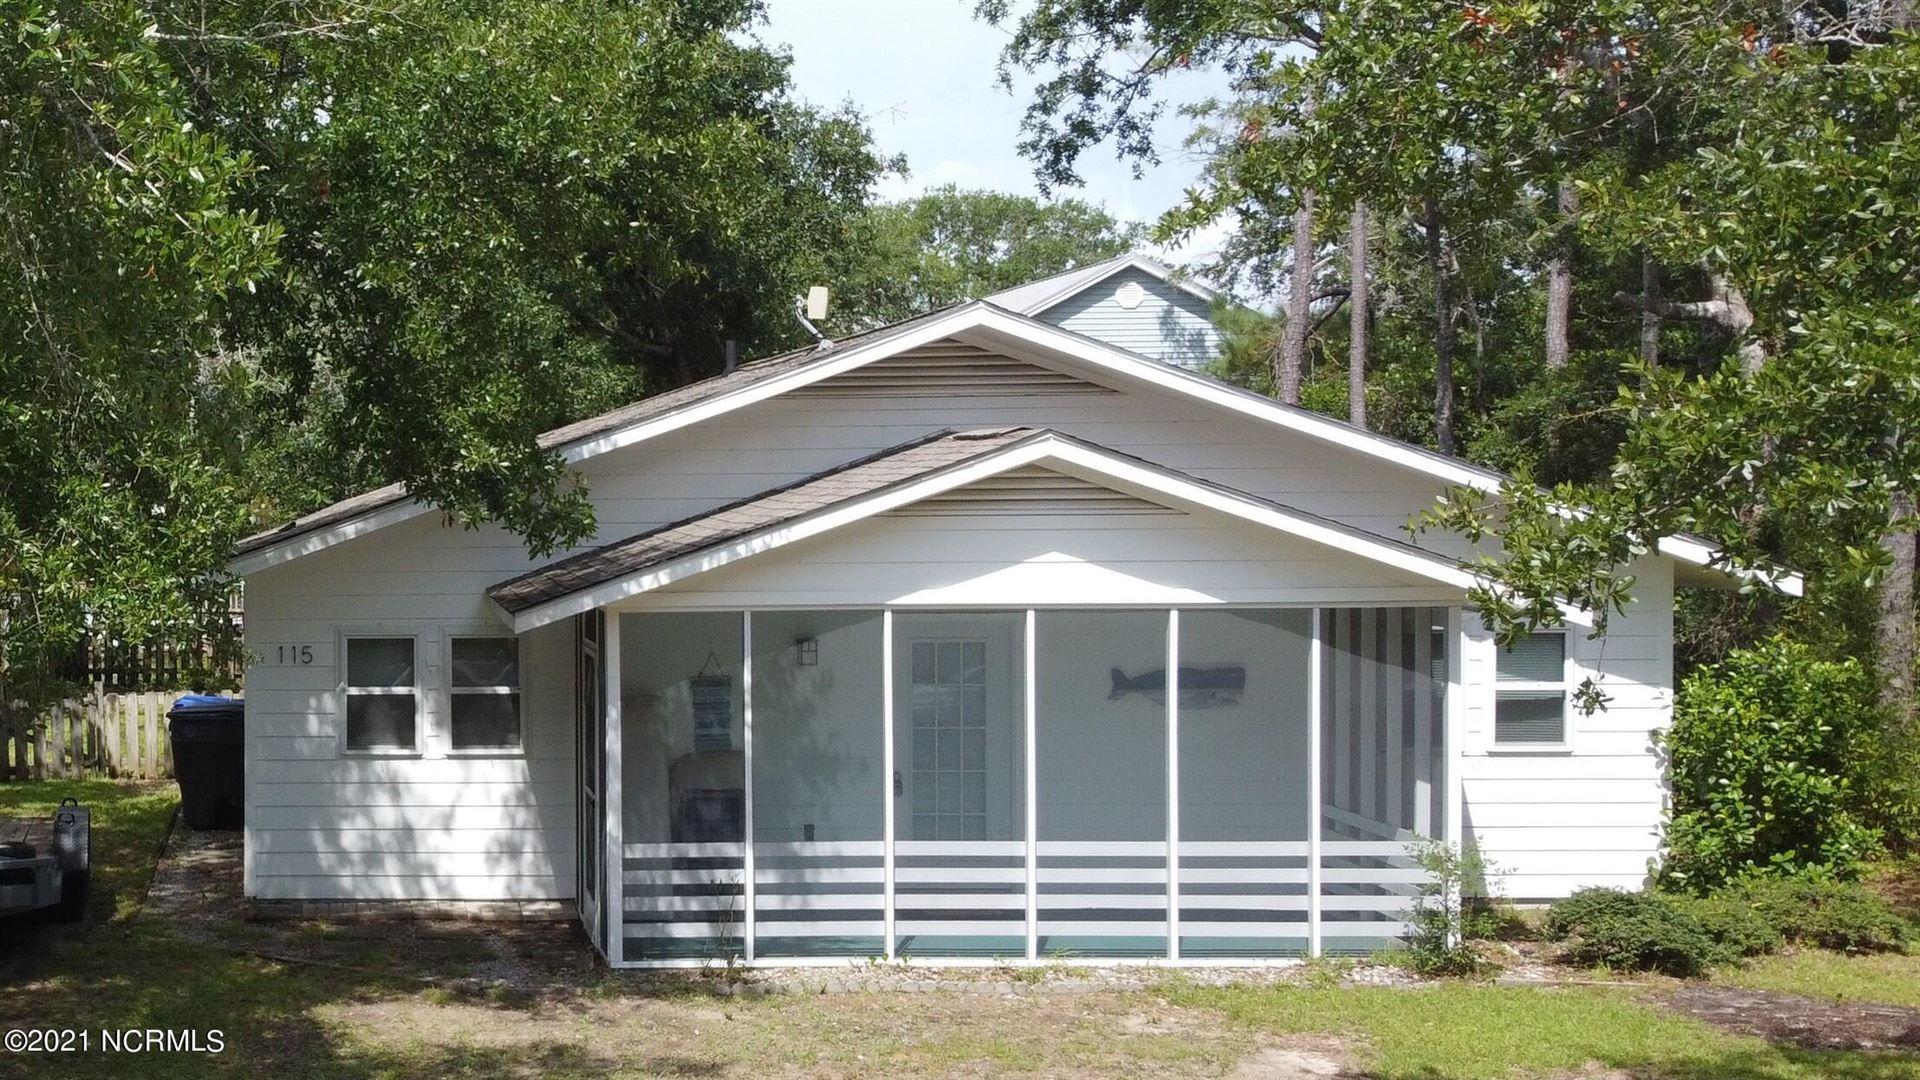 Photo for 115 NE 46th Street, Oak Island, NC 28465 (MLS # 100286992)